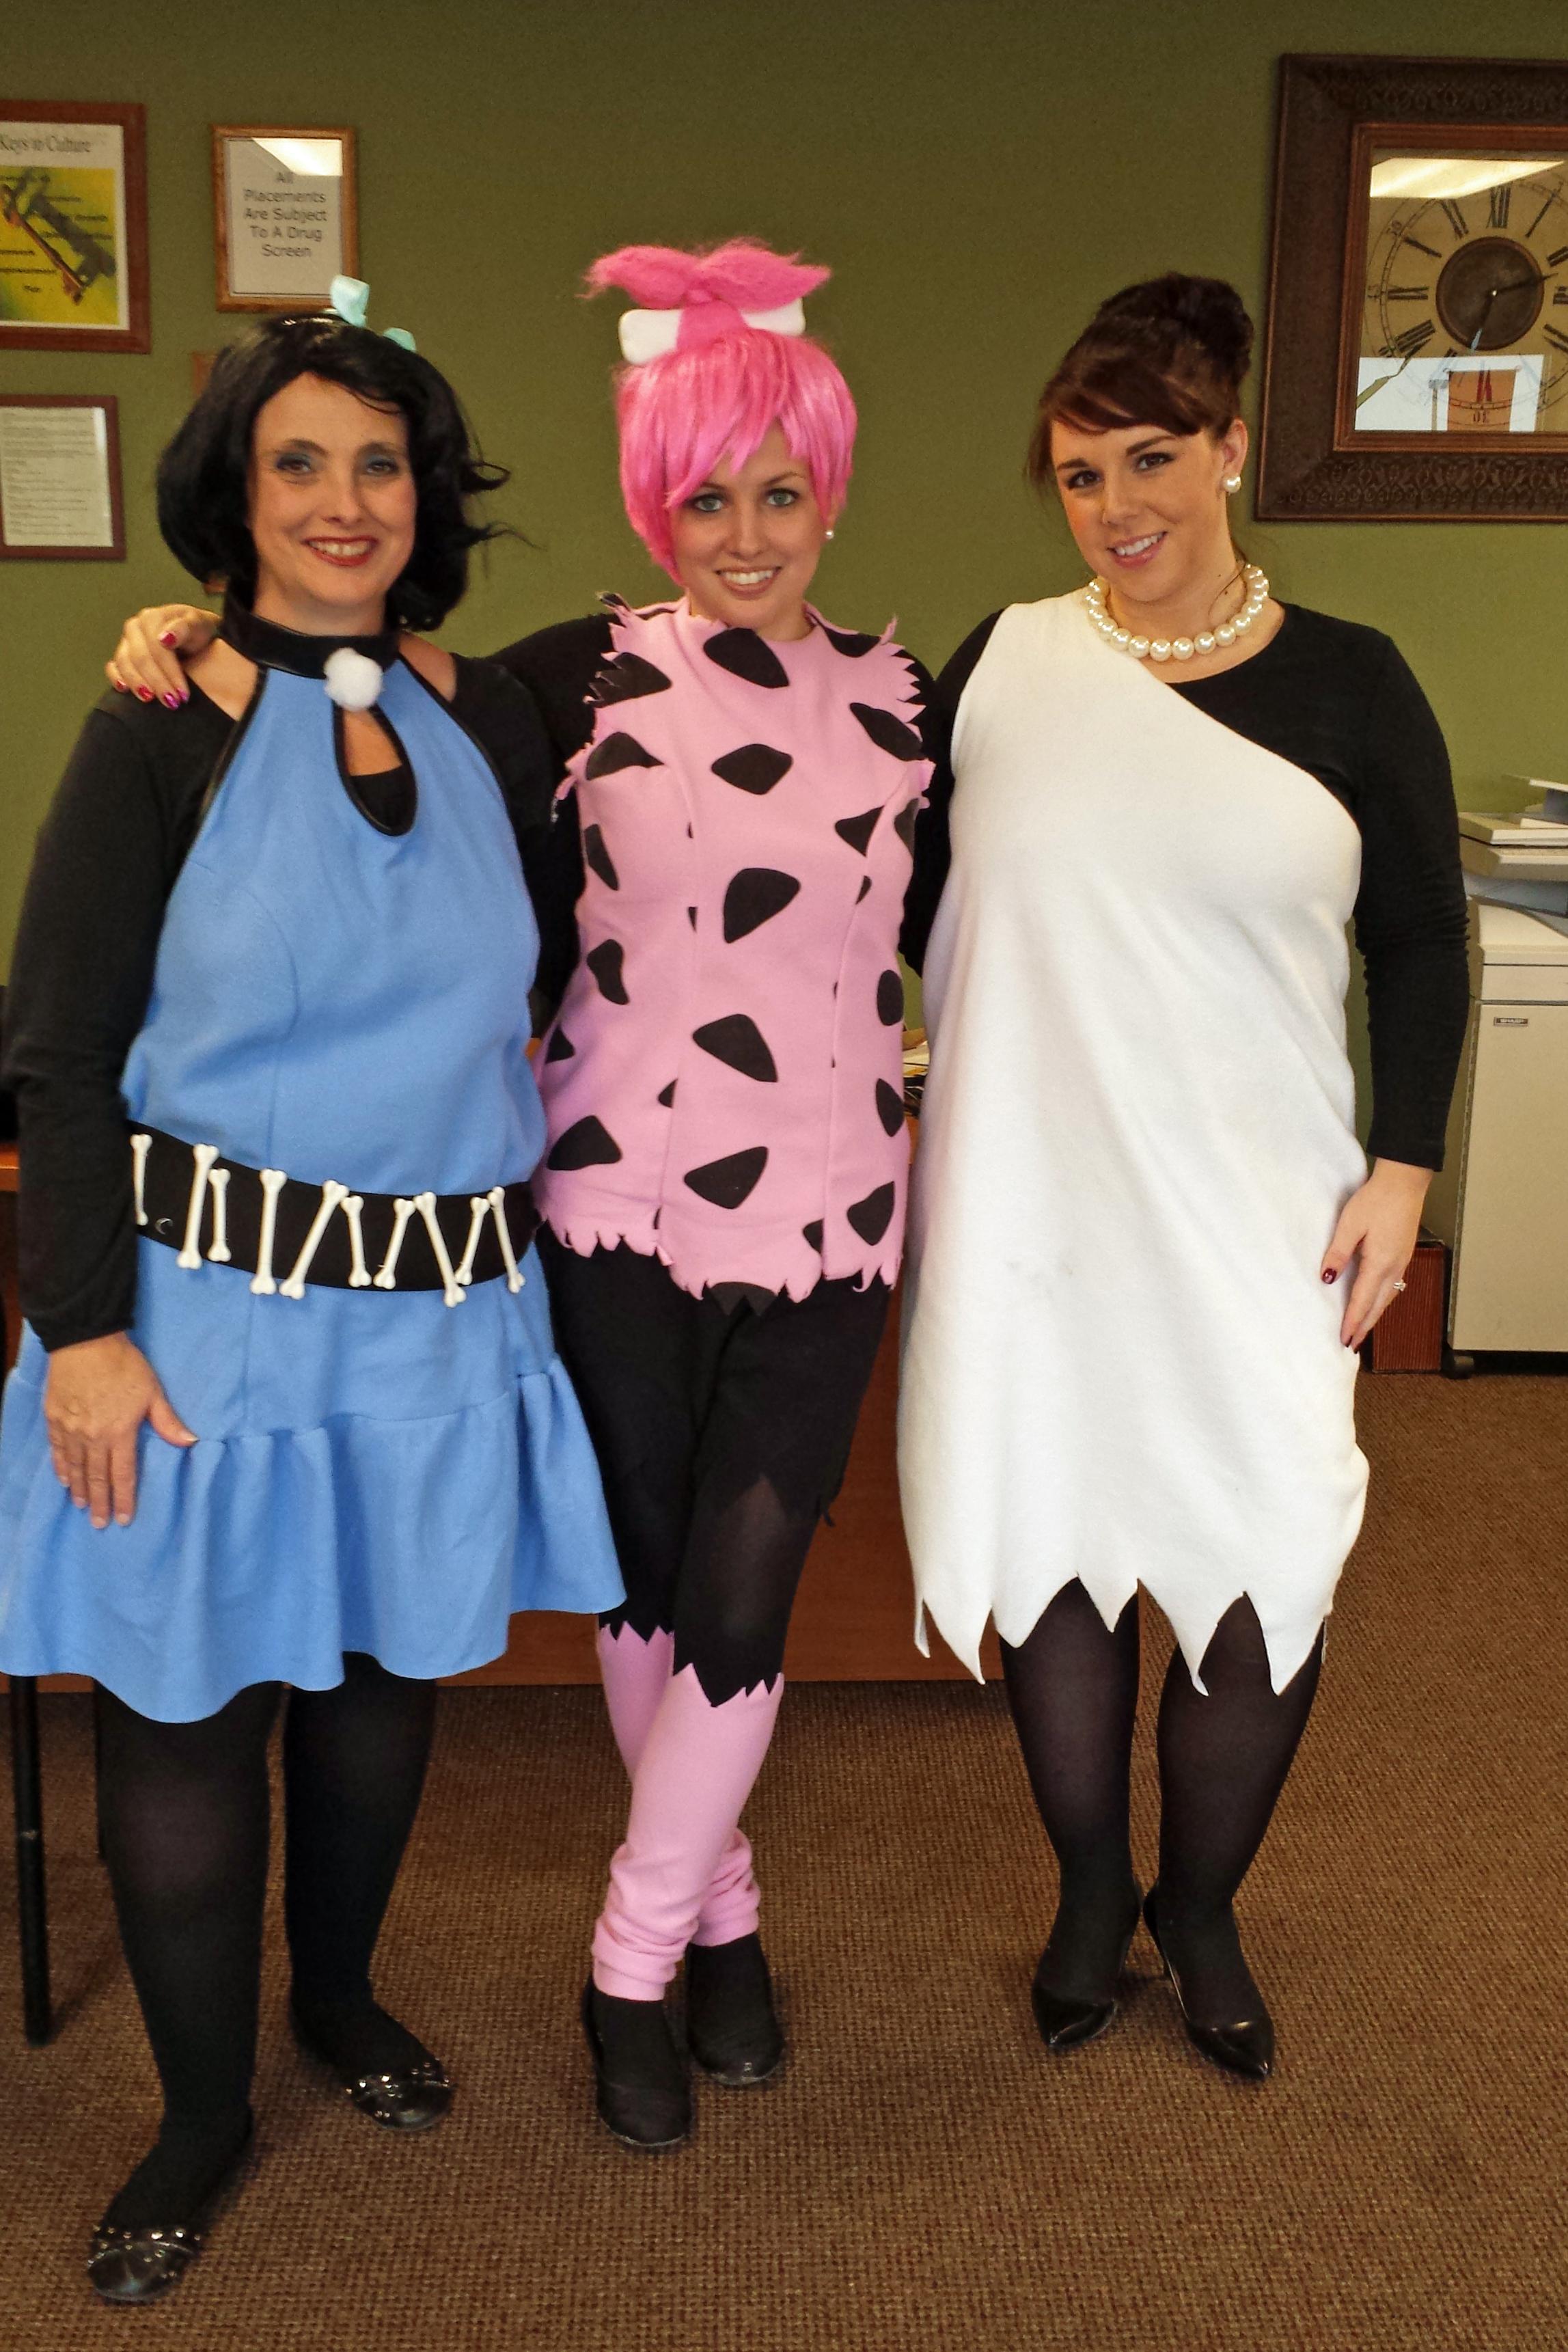 Columbus went back in time to honor the Flintstones. Tonya, Erica, & Sheila.